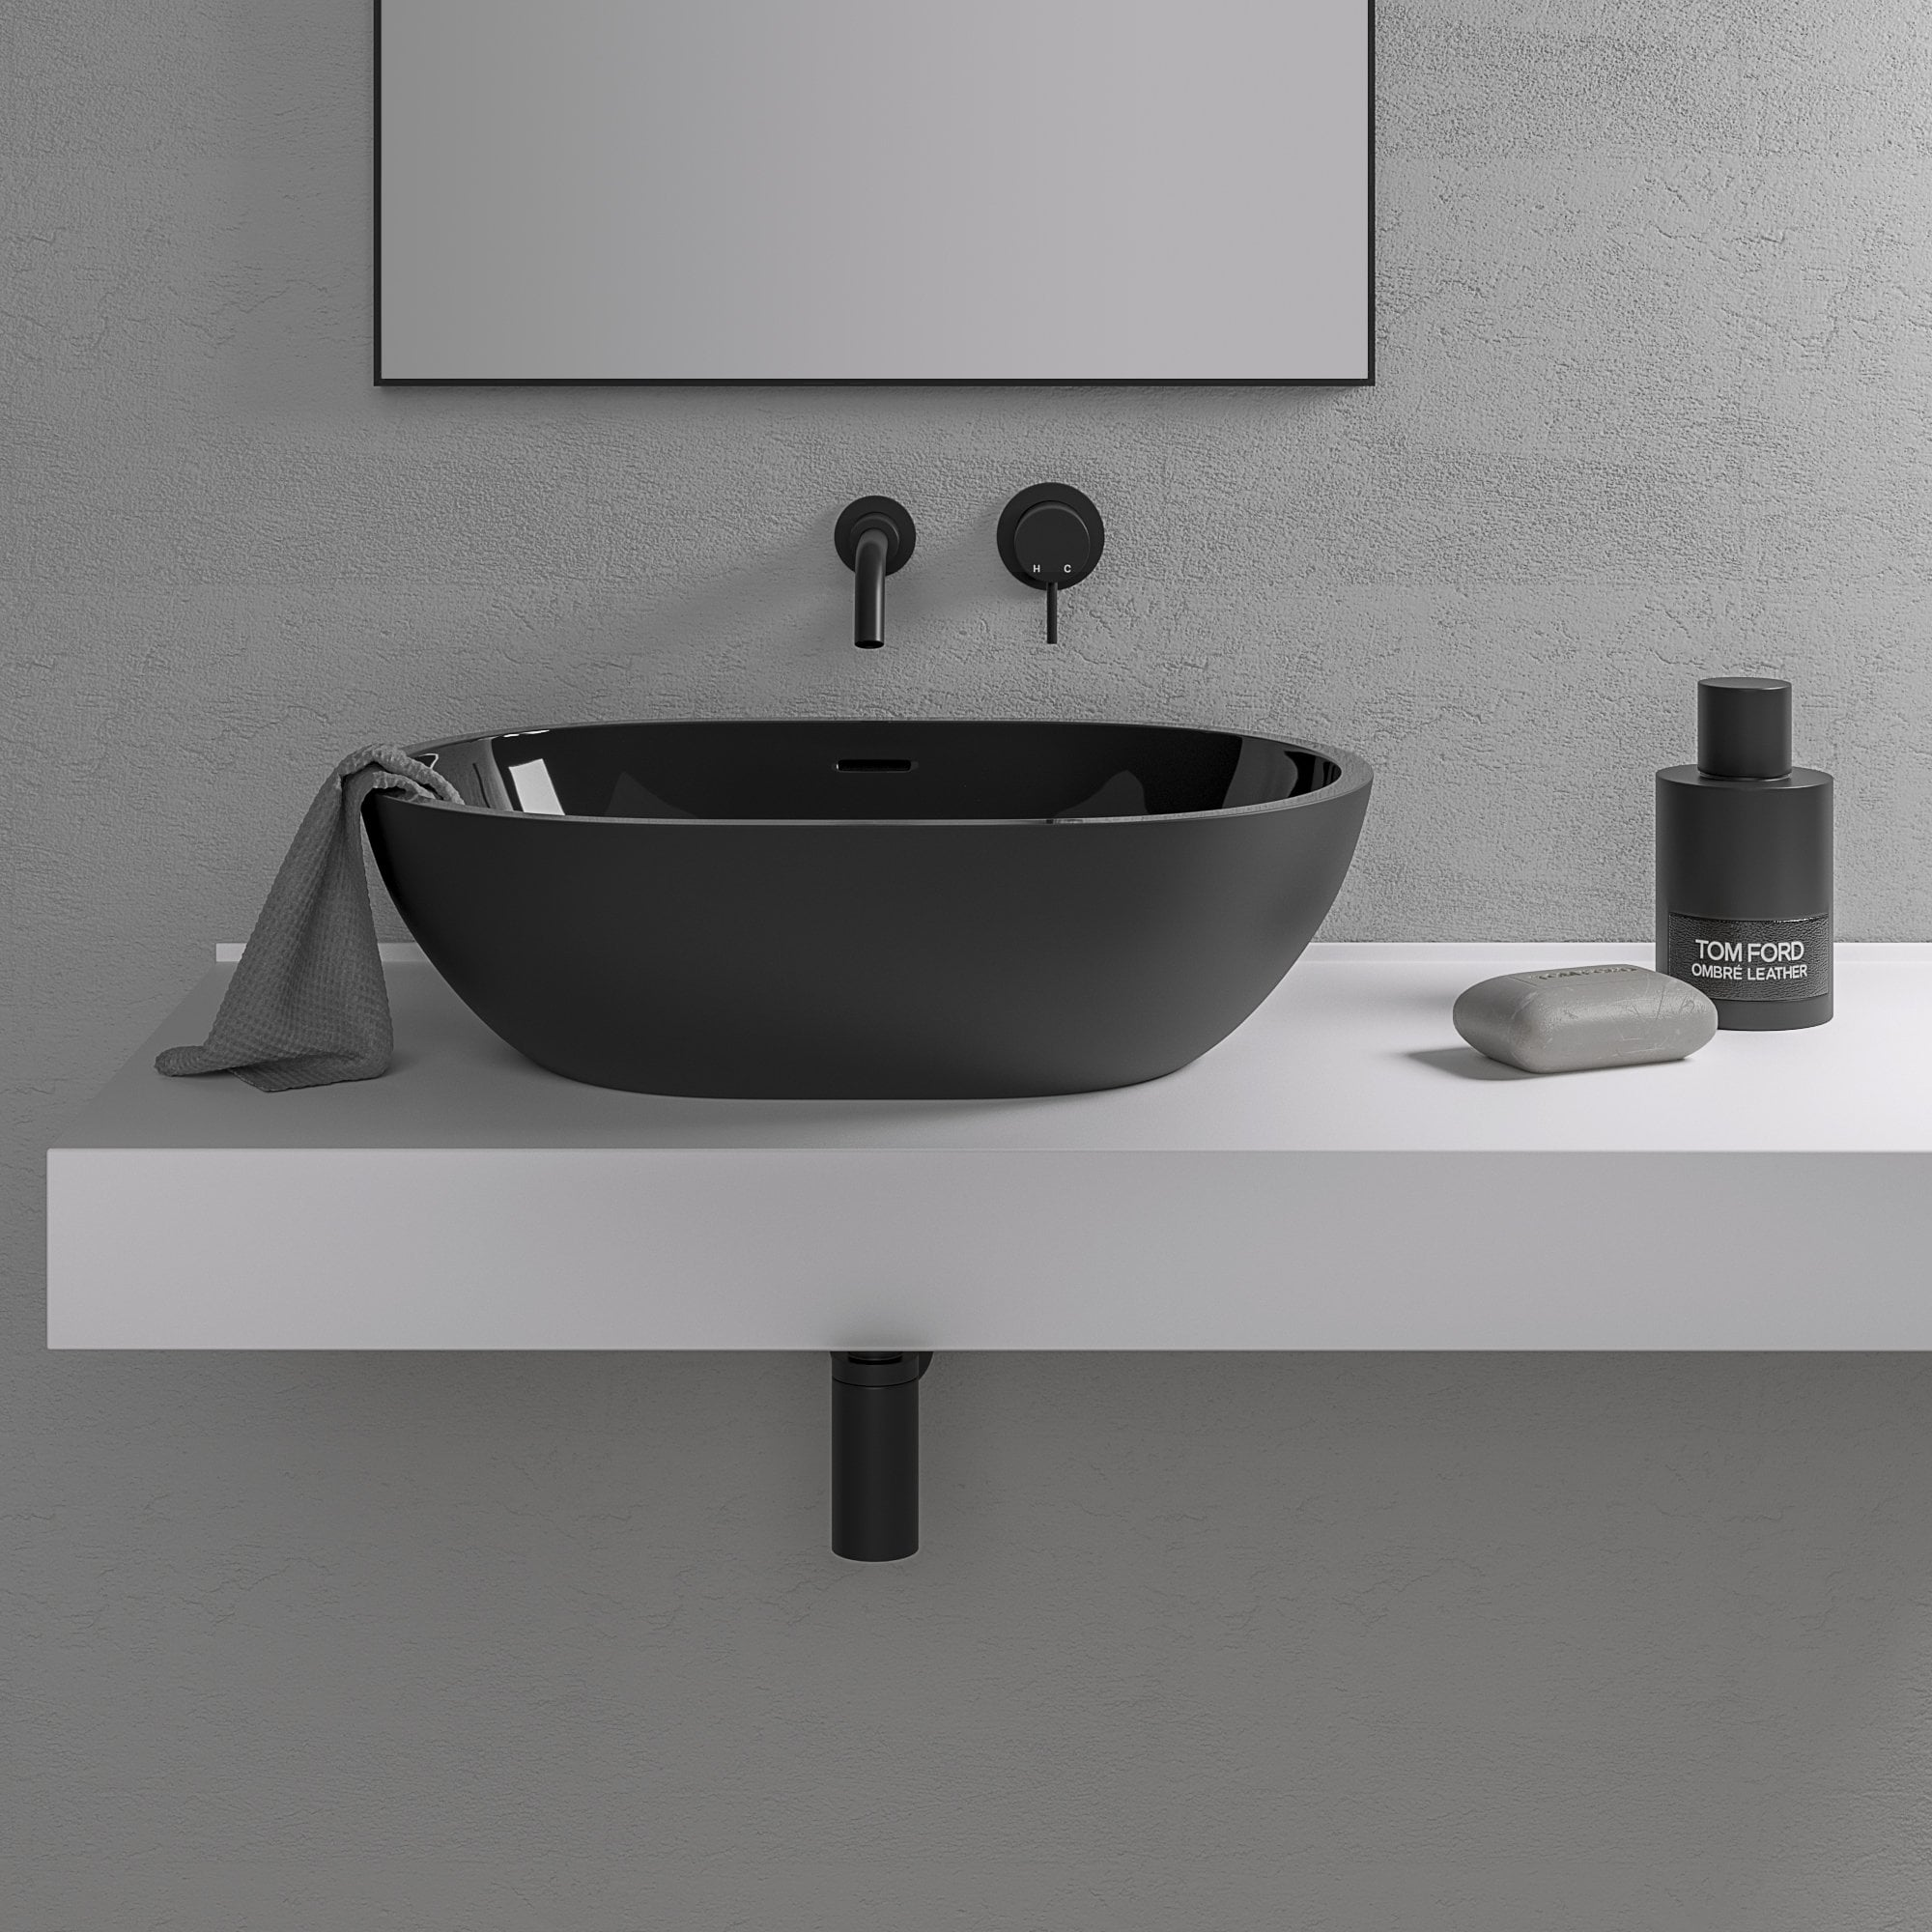 Black Resin Sink Counter Top